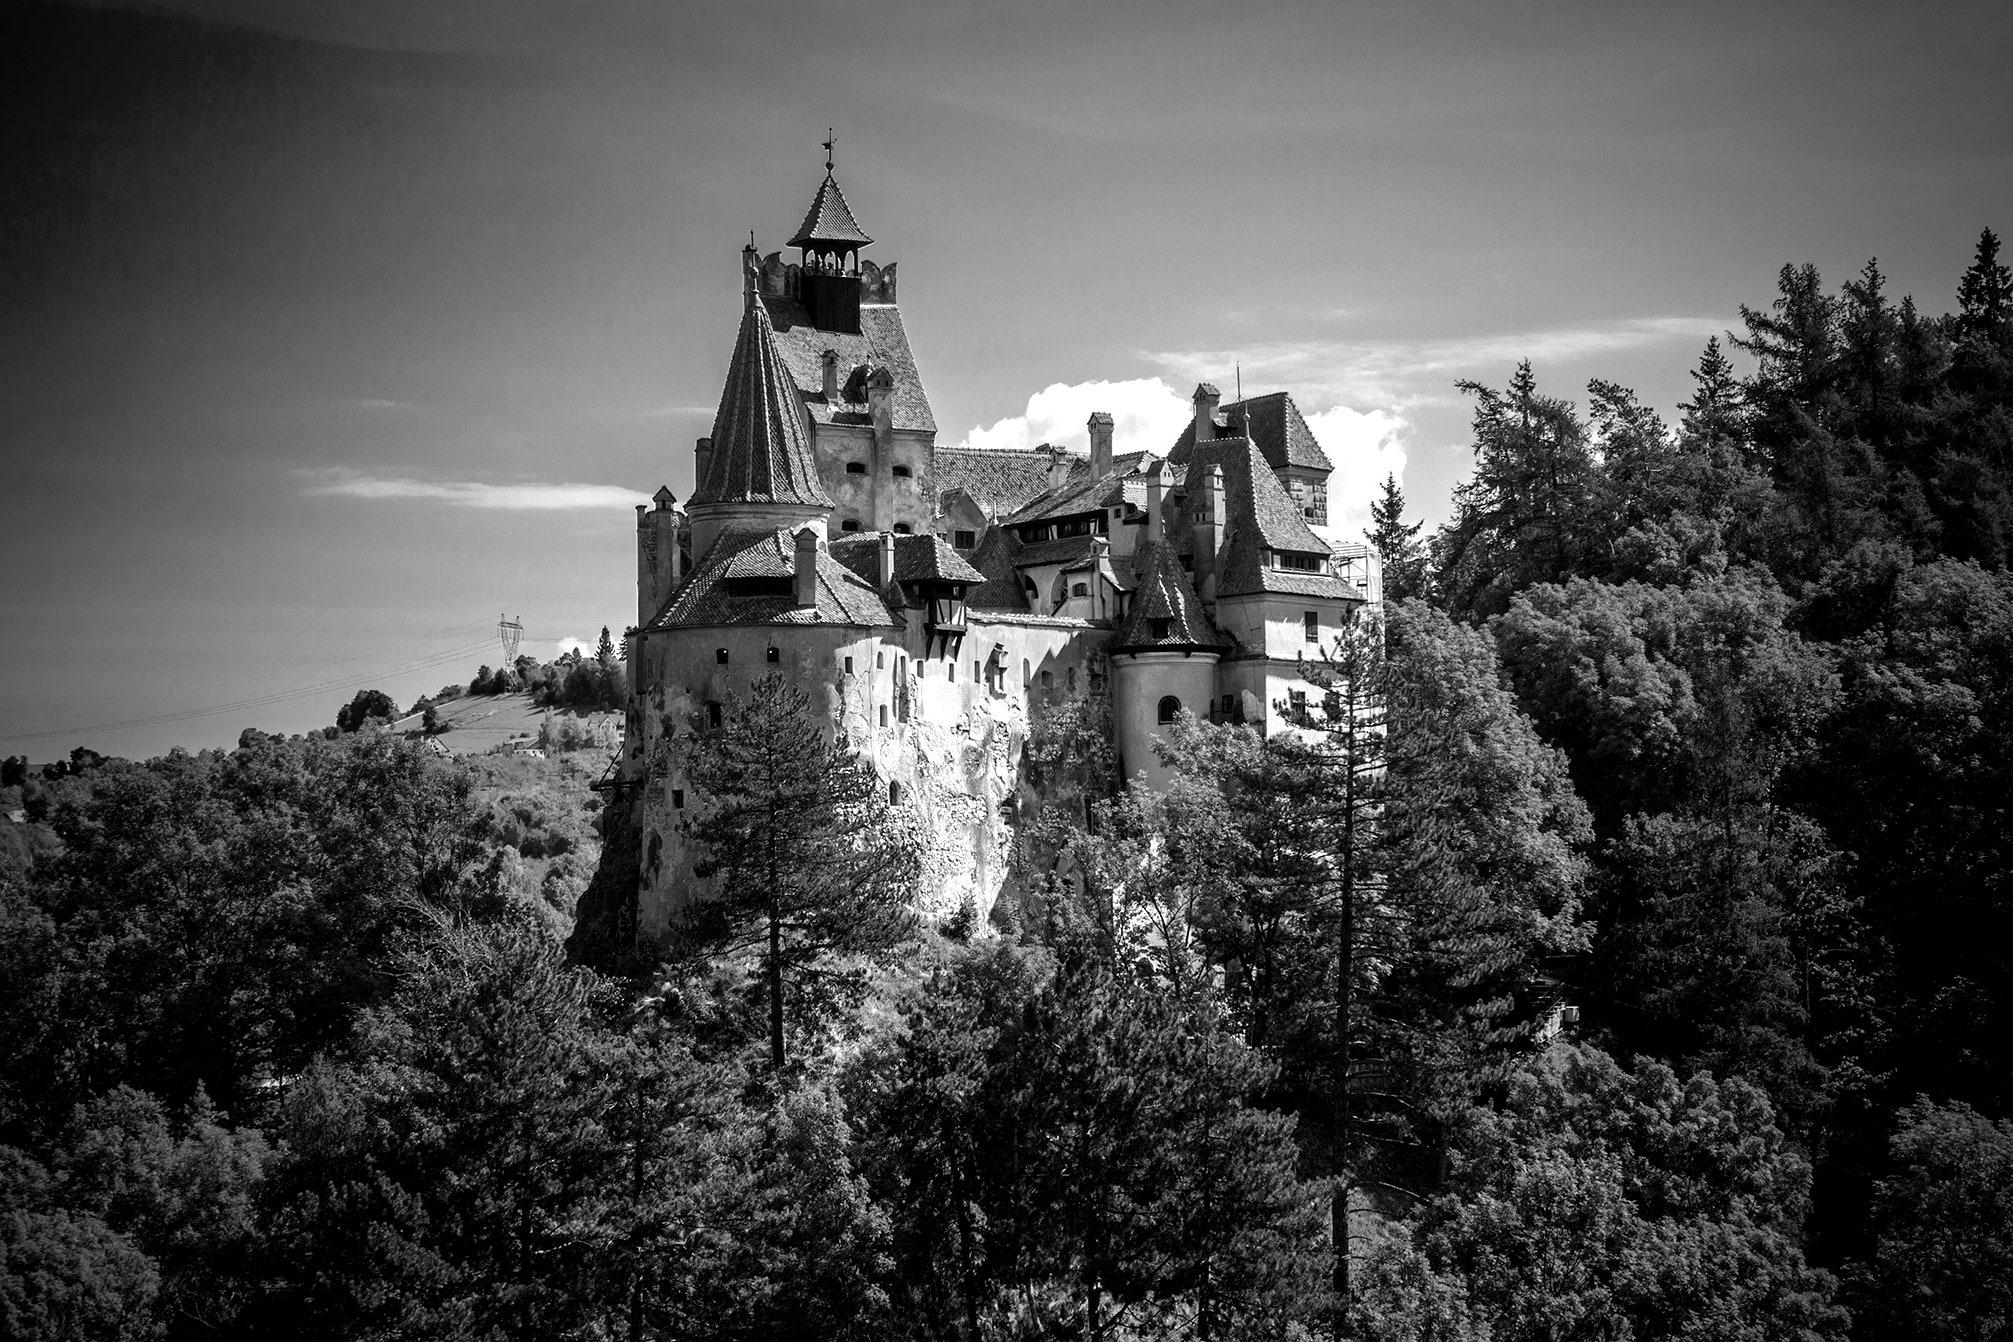 Kastil Drakula Jadi Tempat Vaksinasi Covid-19